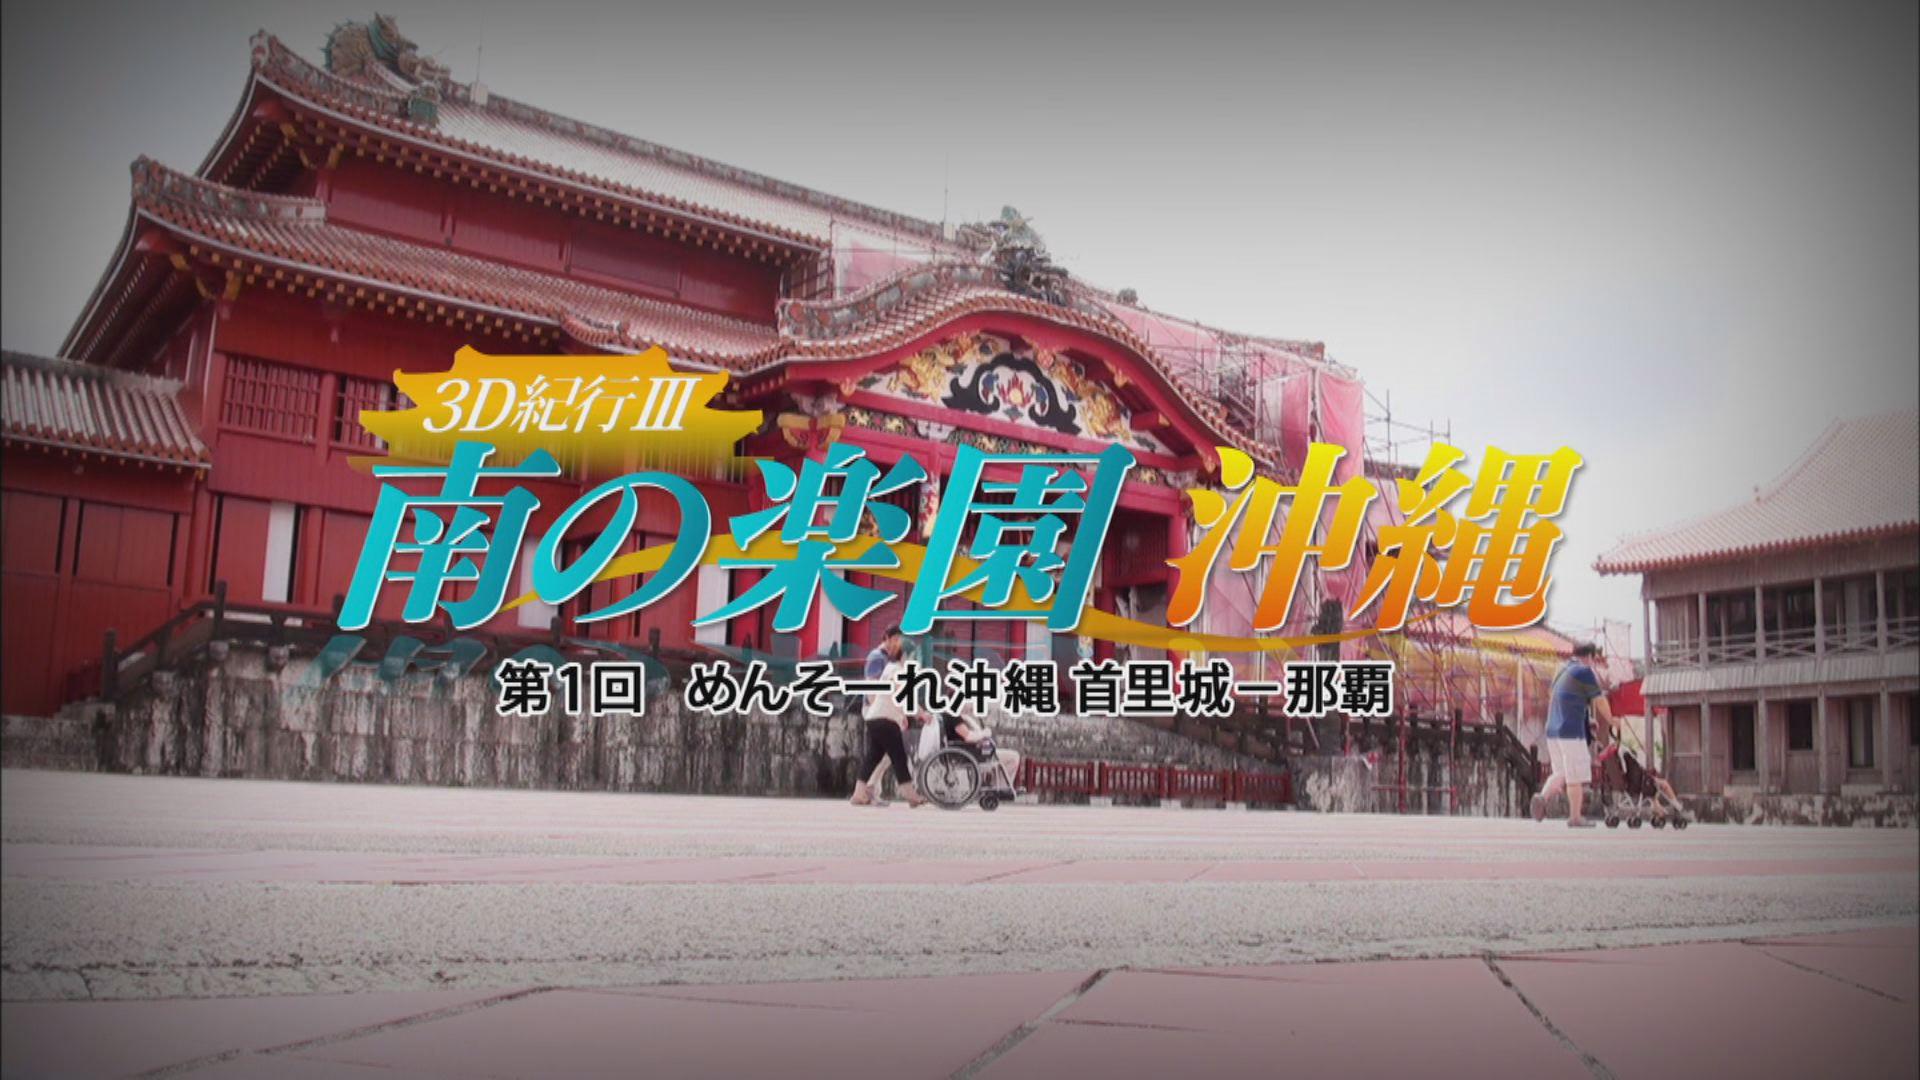 3D紀行Ⅲ 南の楽園 沖縄